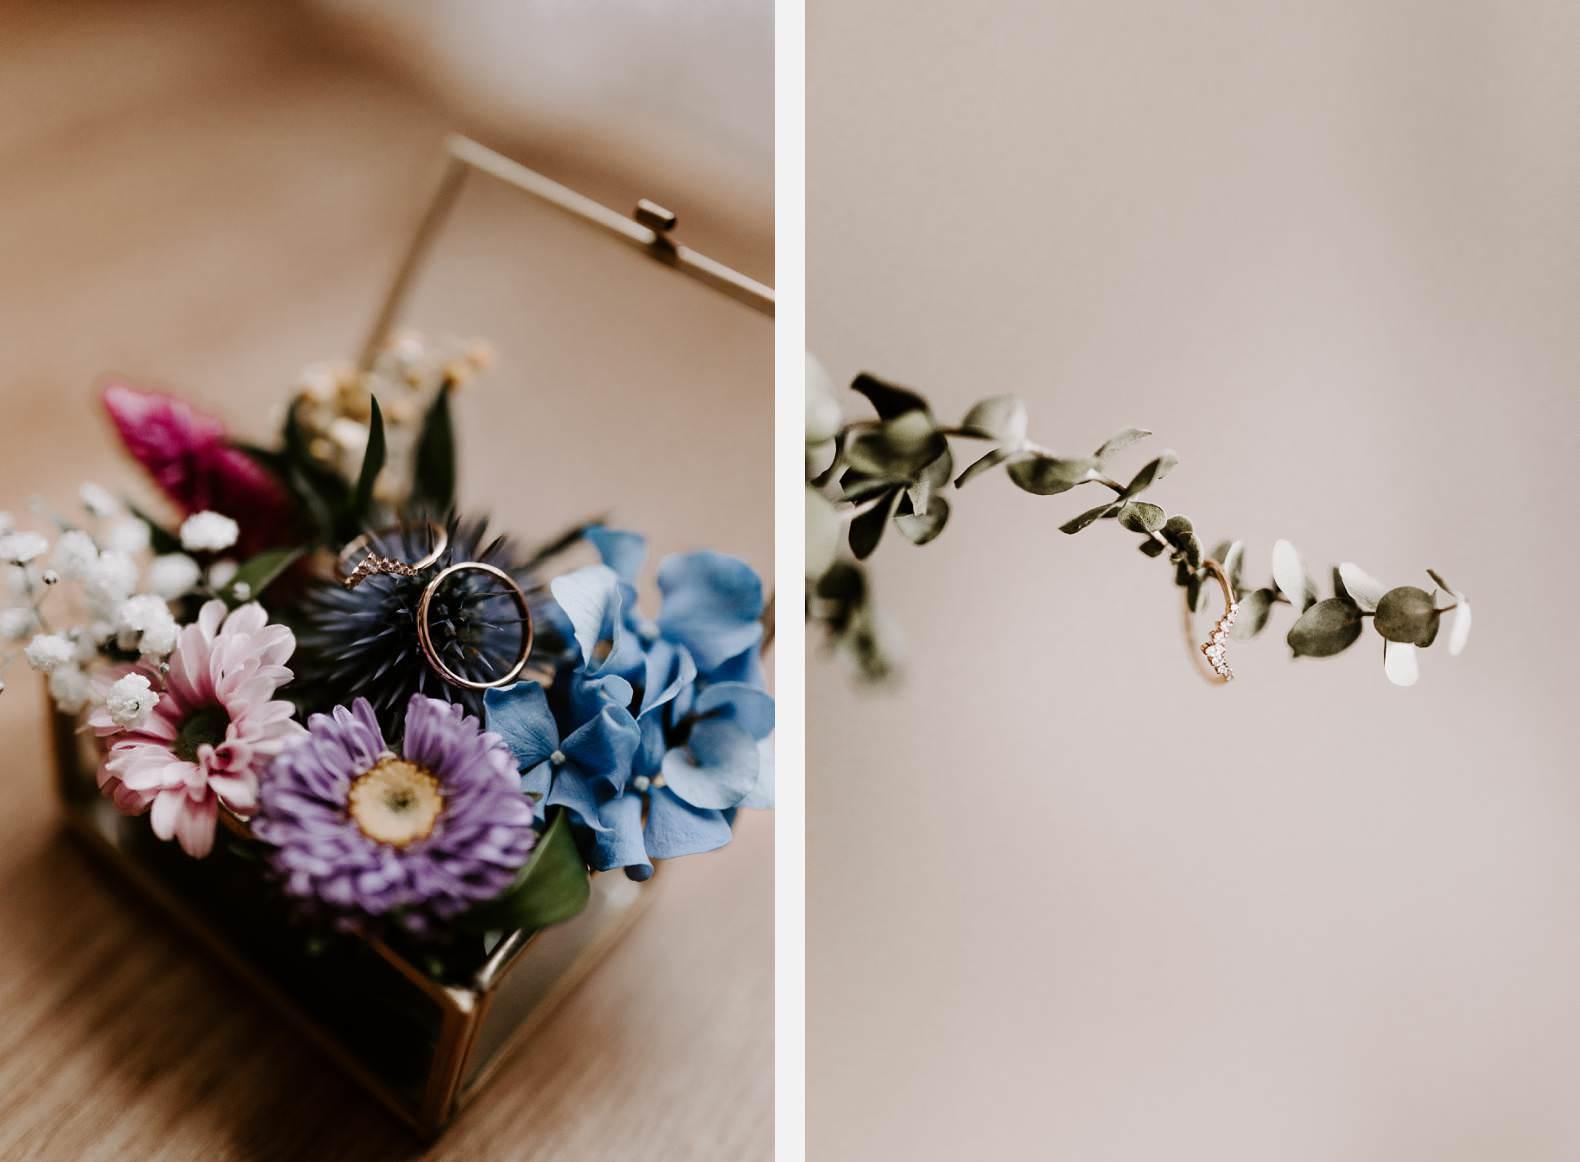 mariage manoir de corny photographe bel esprit 0008 1